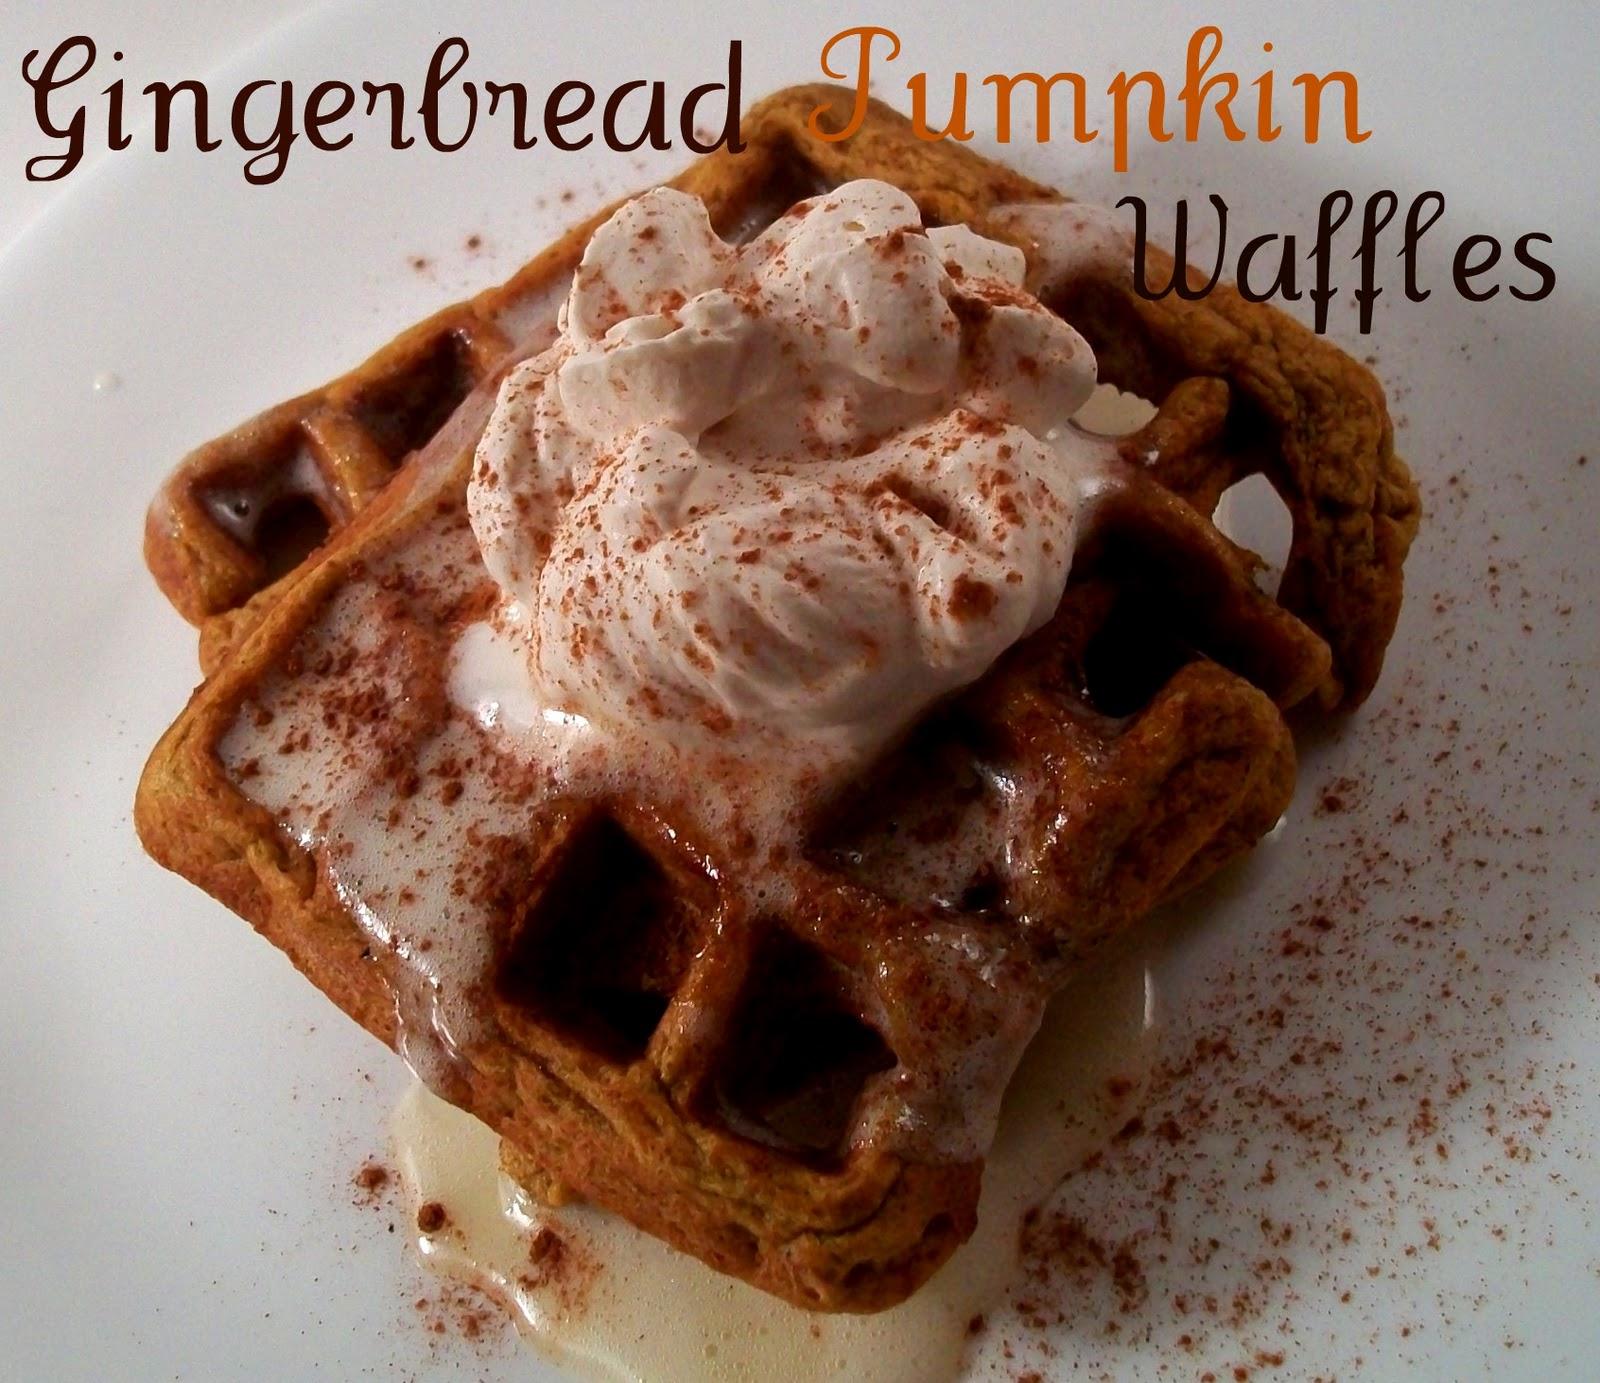 The Farm Girl Recipes: Gingerbread Pumpkin Waffles